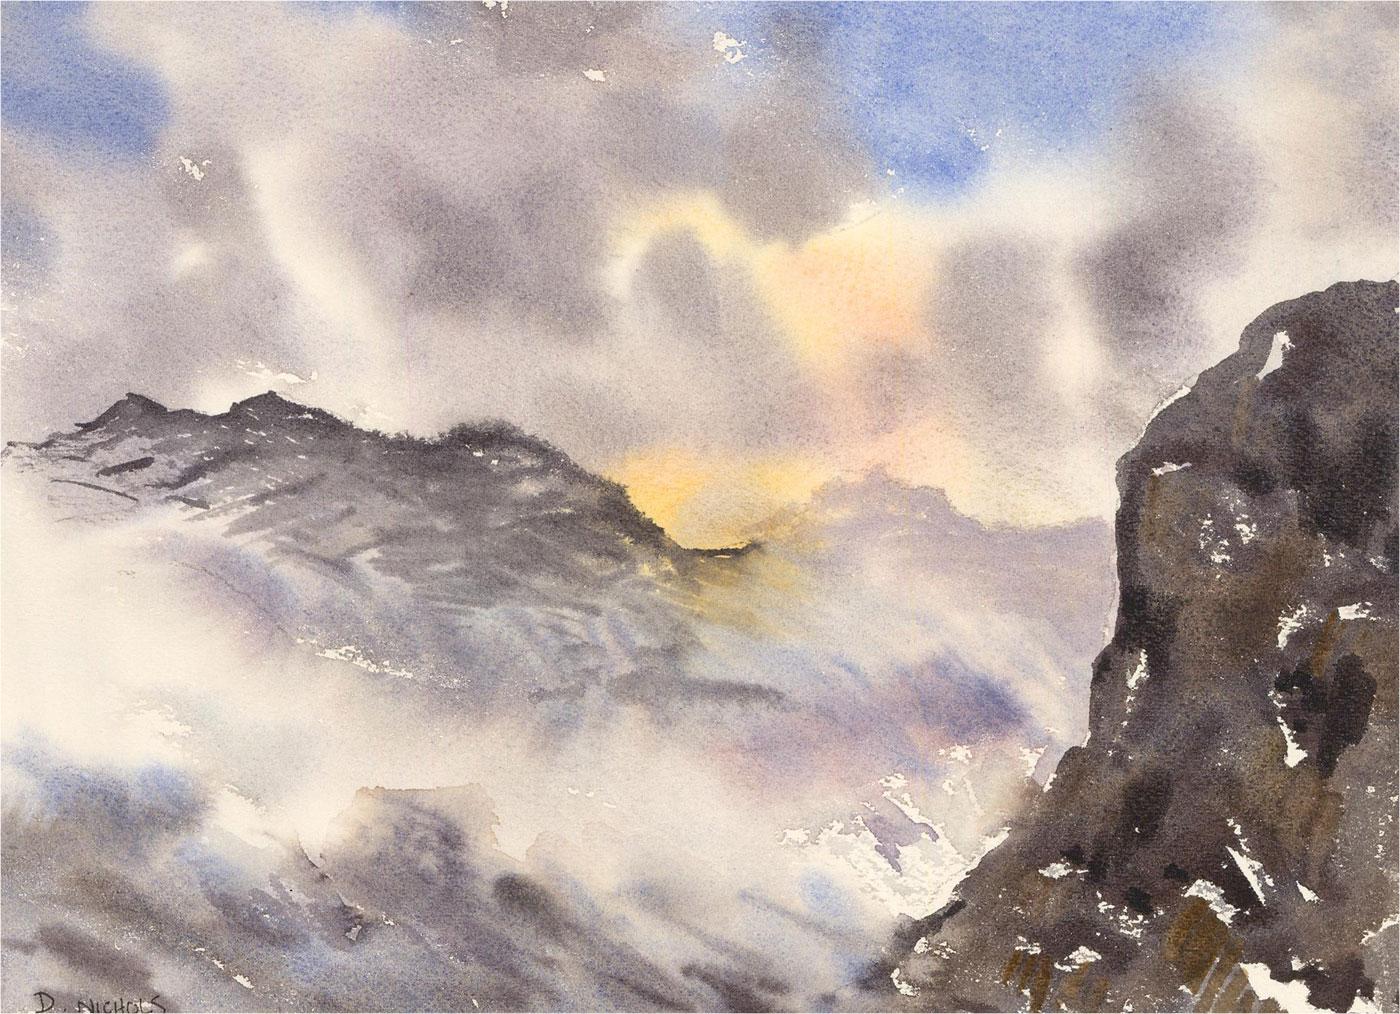 Daniel Nichols - Contemporary Watercolour, Bowfell Peak, Lake District